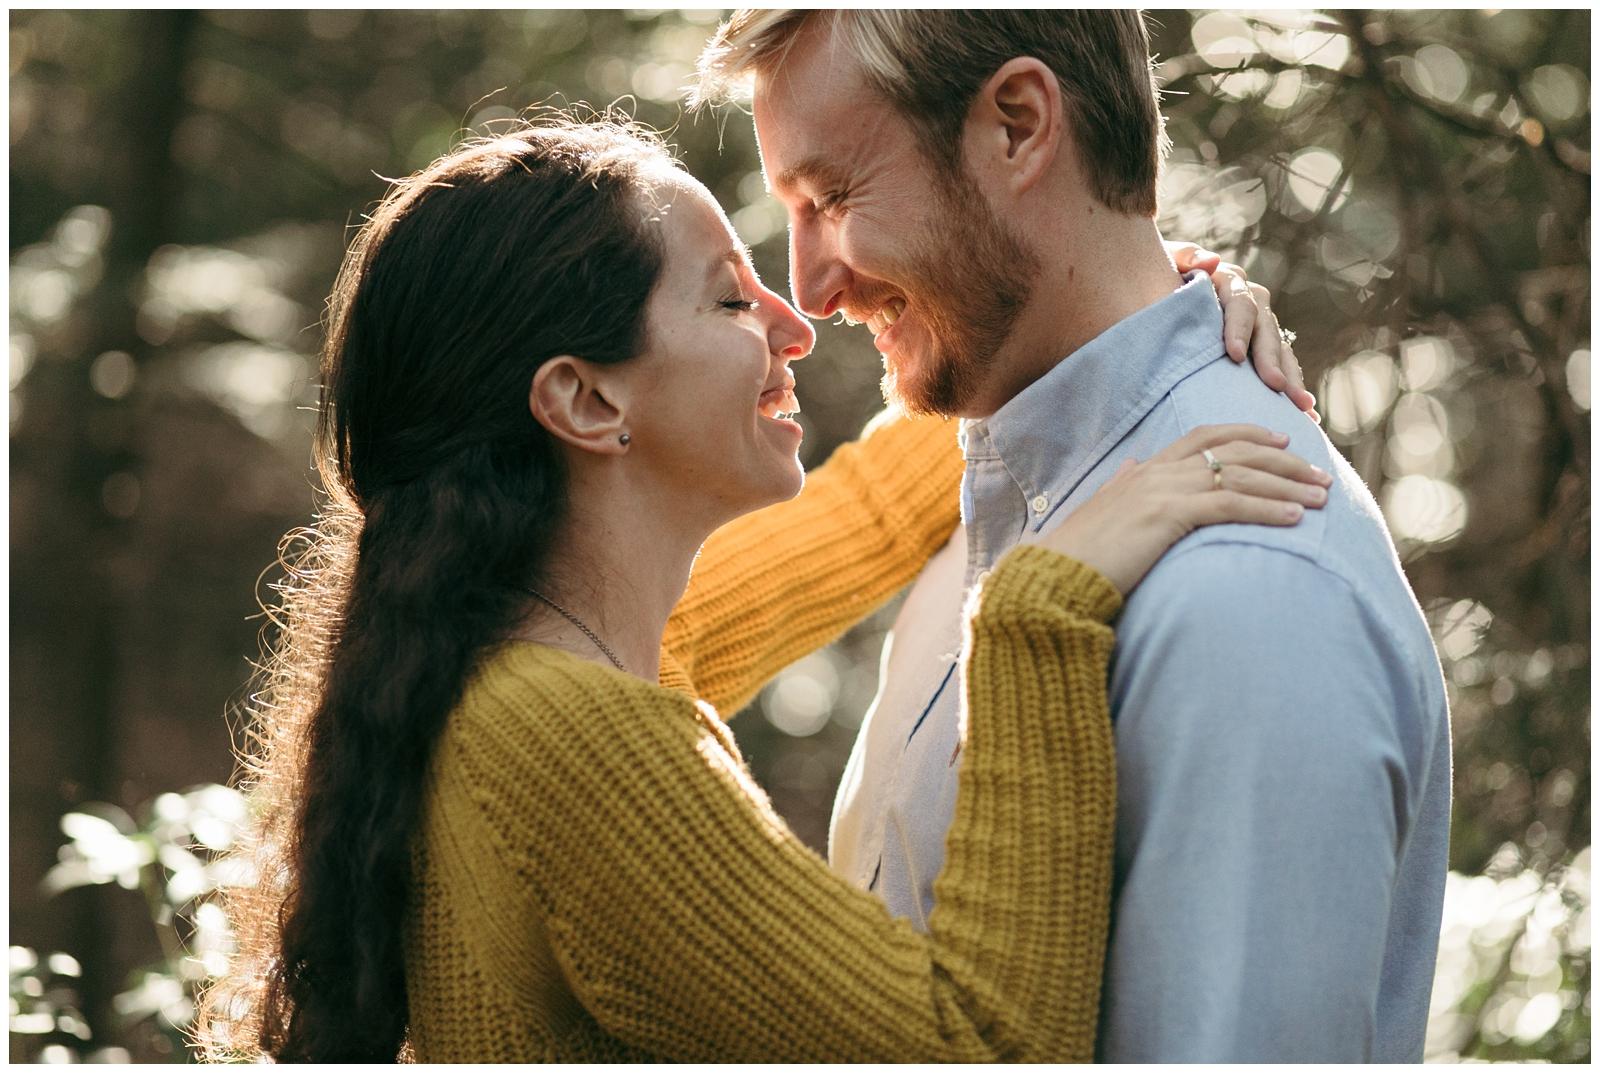 Connecticut-Engagement-Photographer-Bailey-Q-Photo-04.jpg